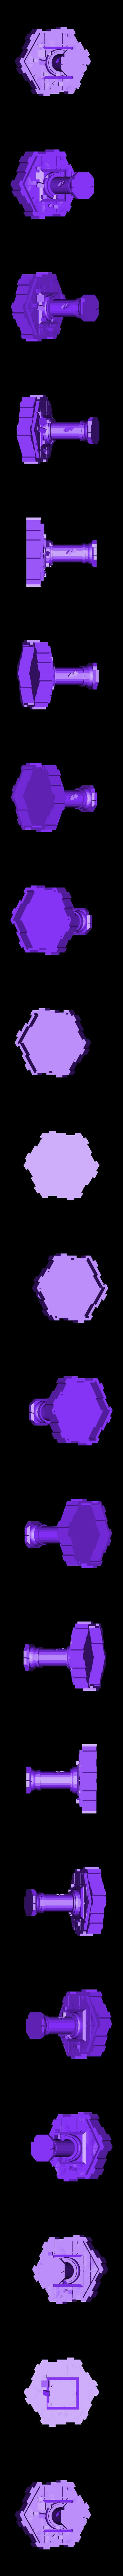 1hex_with_pillar.stl Download free STL file Locking Hex Terrain Stone Path • 3D print object, mrhers2